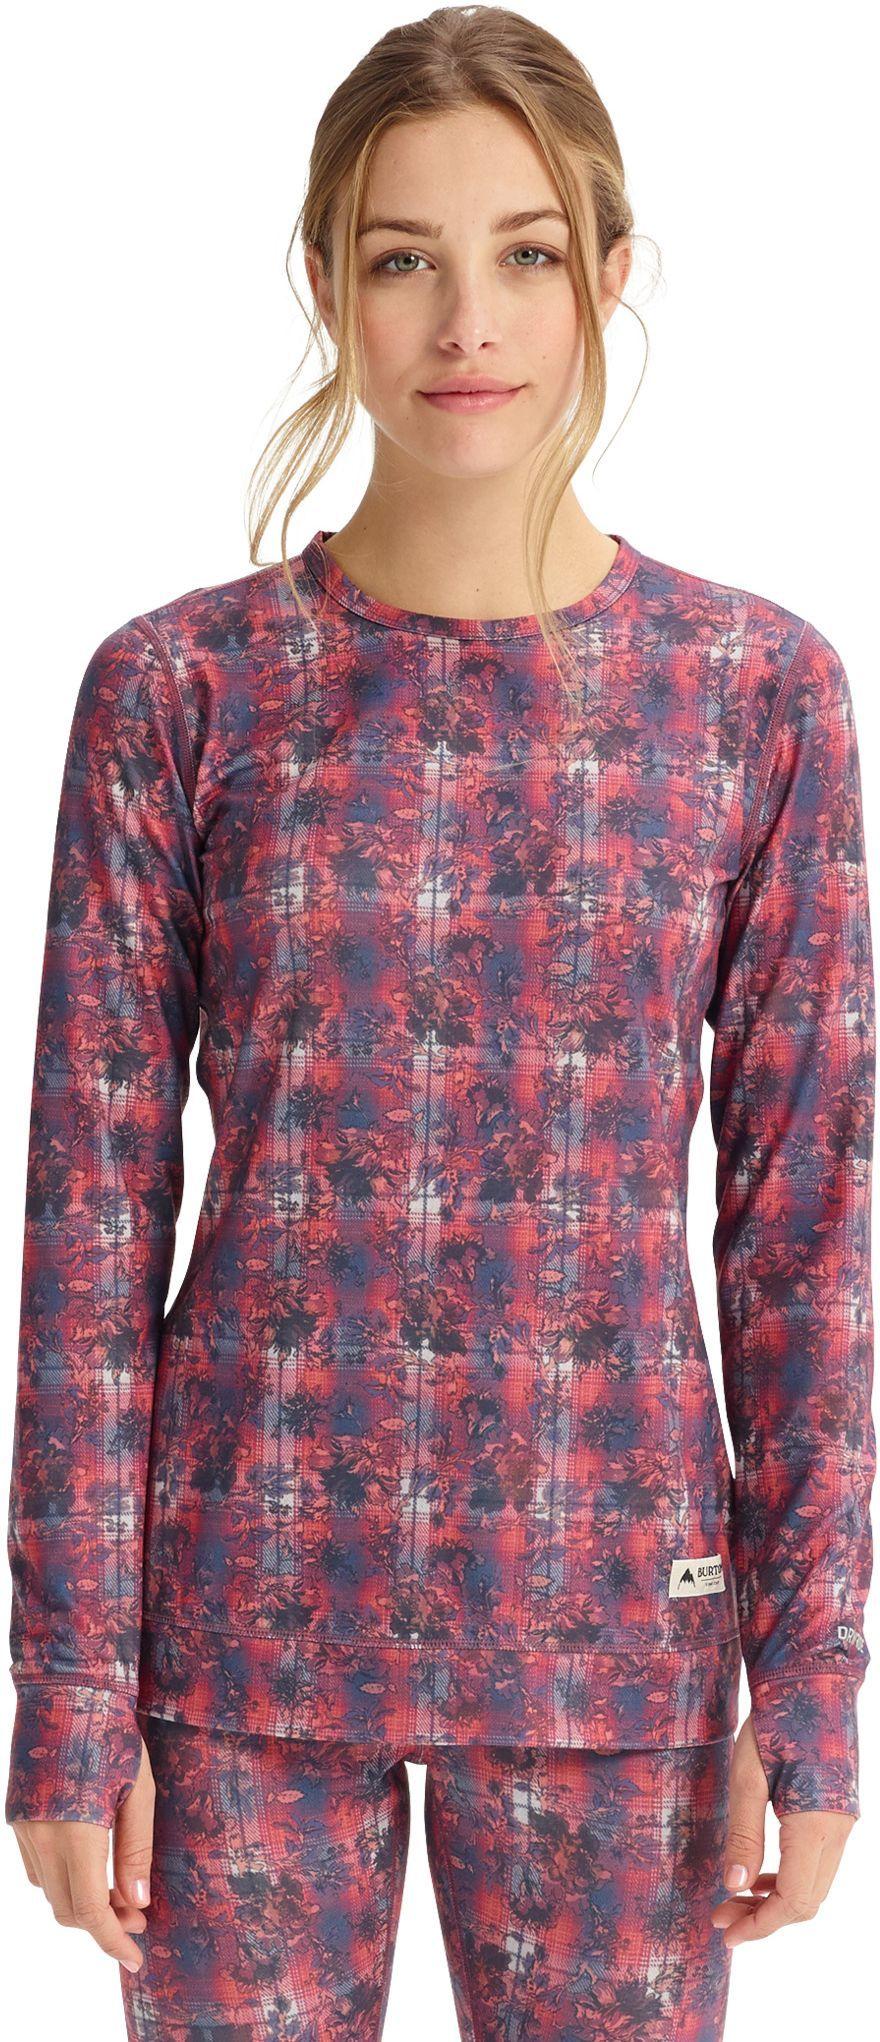 bielizna termoaktywna damska - bluza BURTON MIDWEIGHT CREW Nevermind Floral